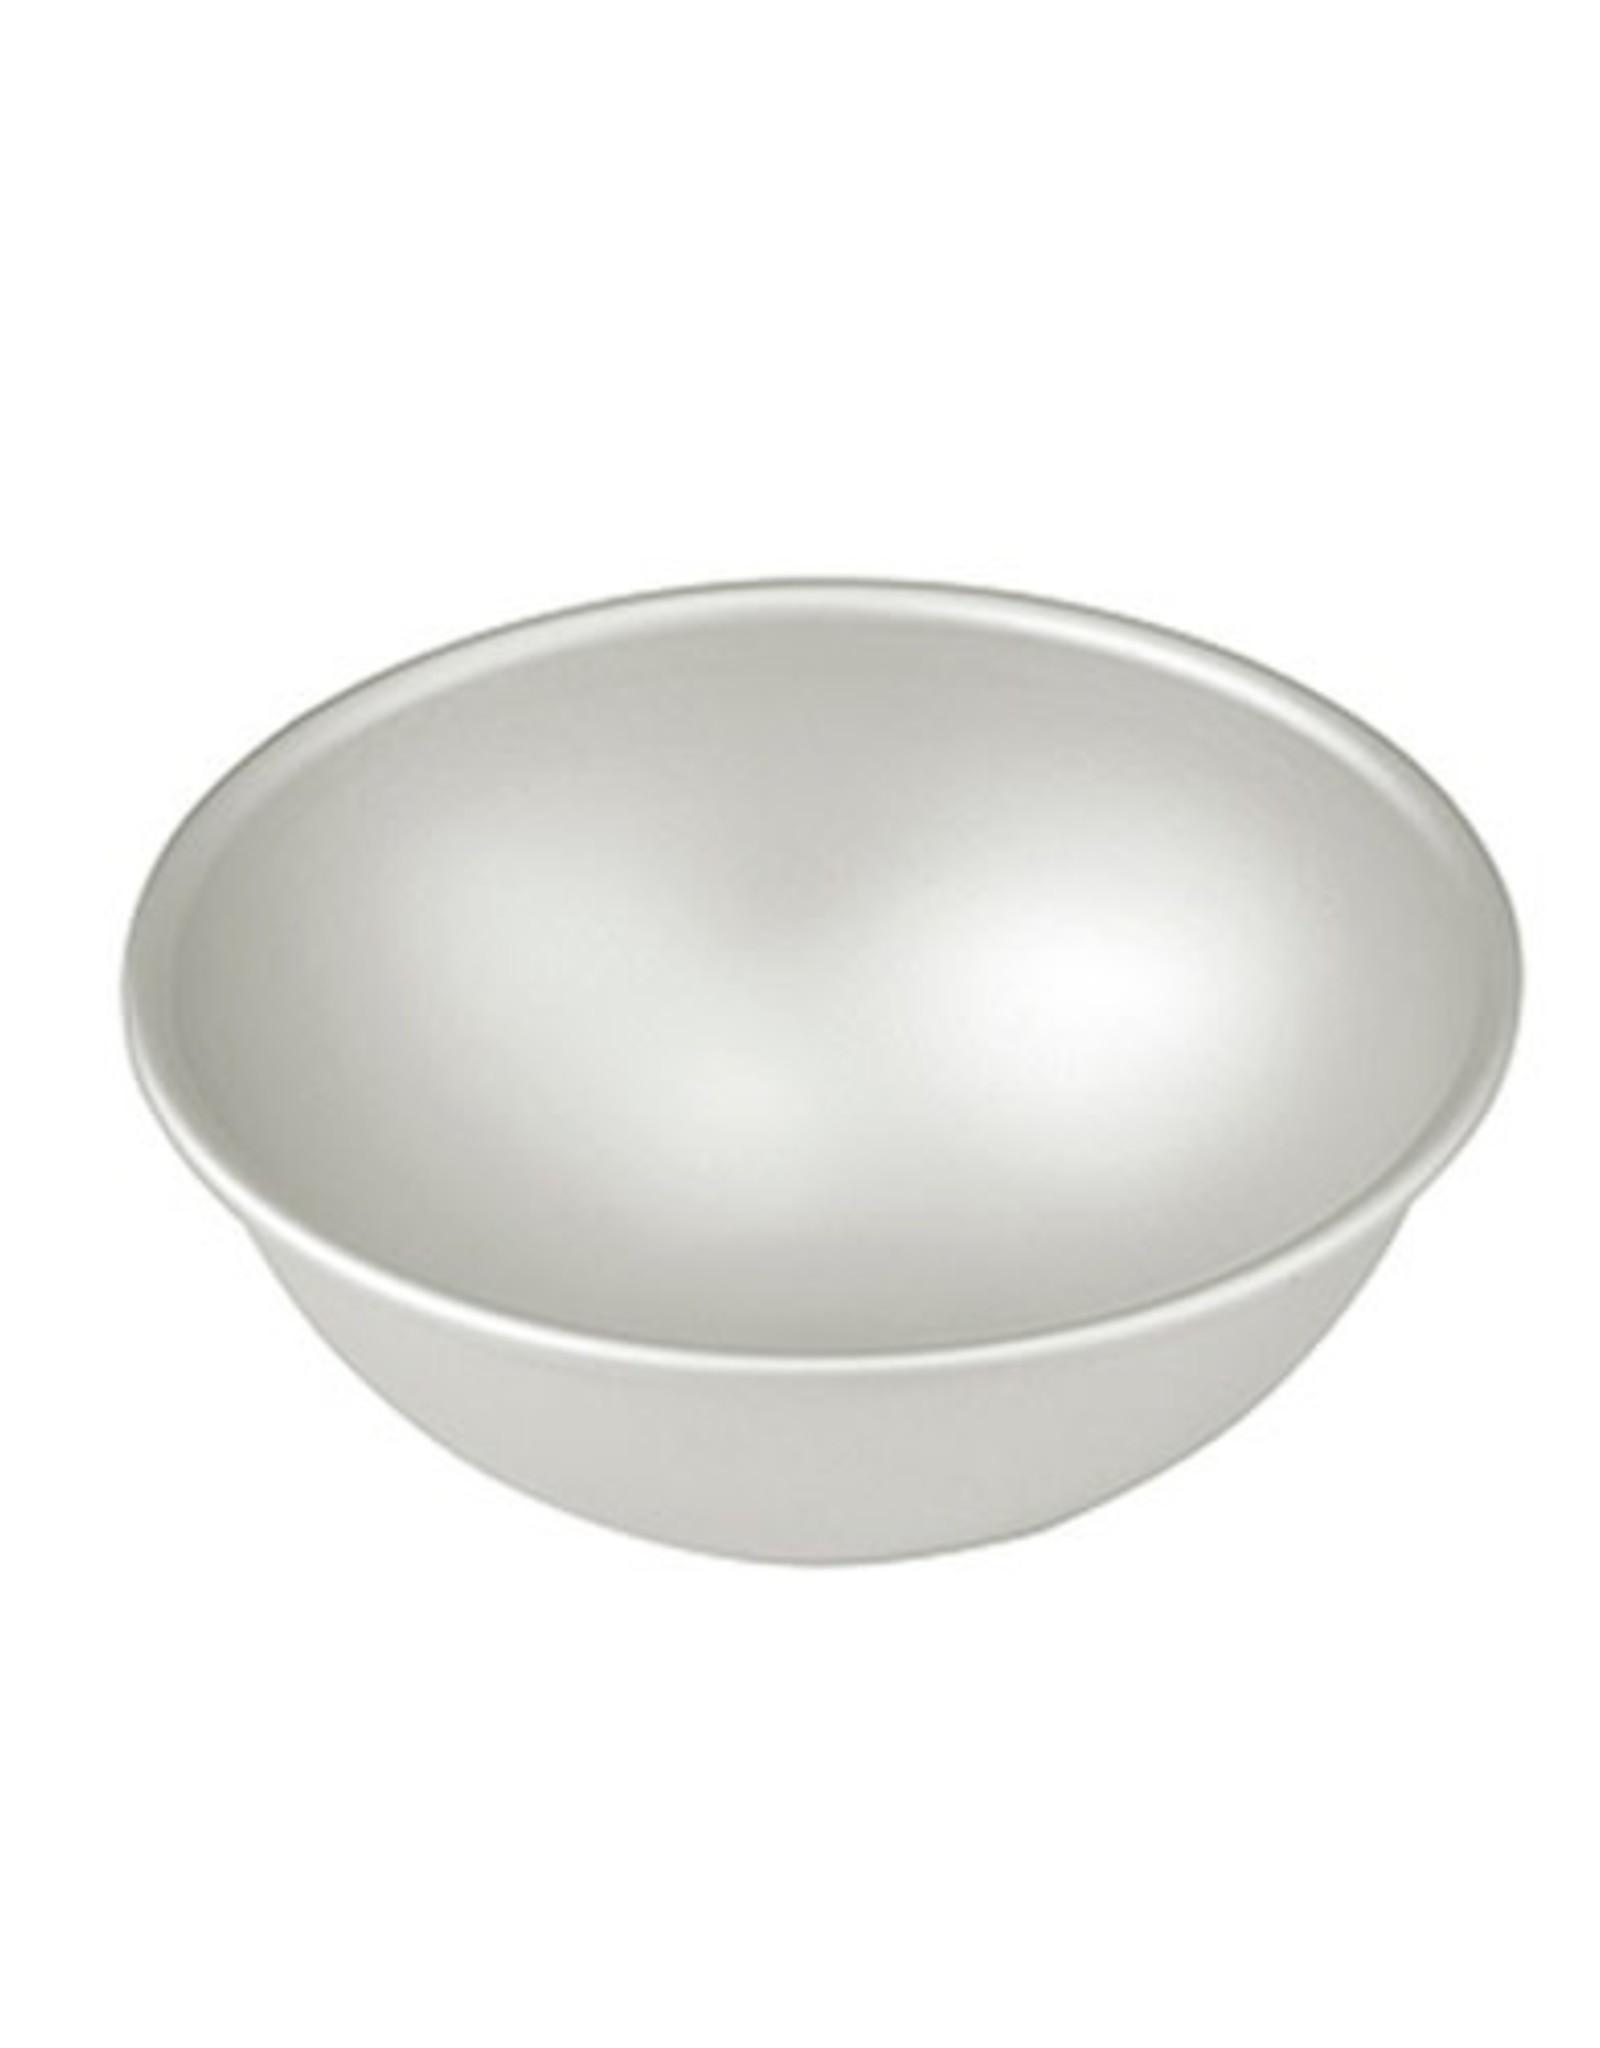 Fat Daddio's Fat Daddio's ProSeries Ball Pan (Hemisphere) -Ø8,9cm-